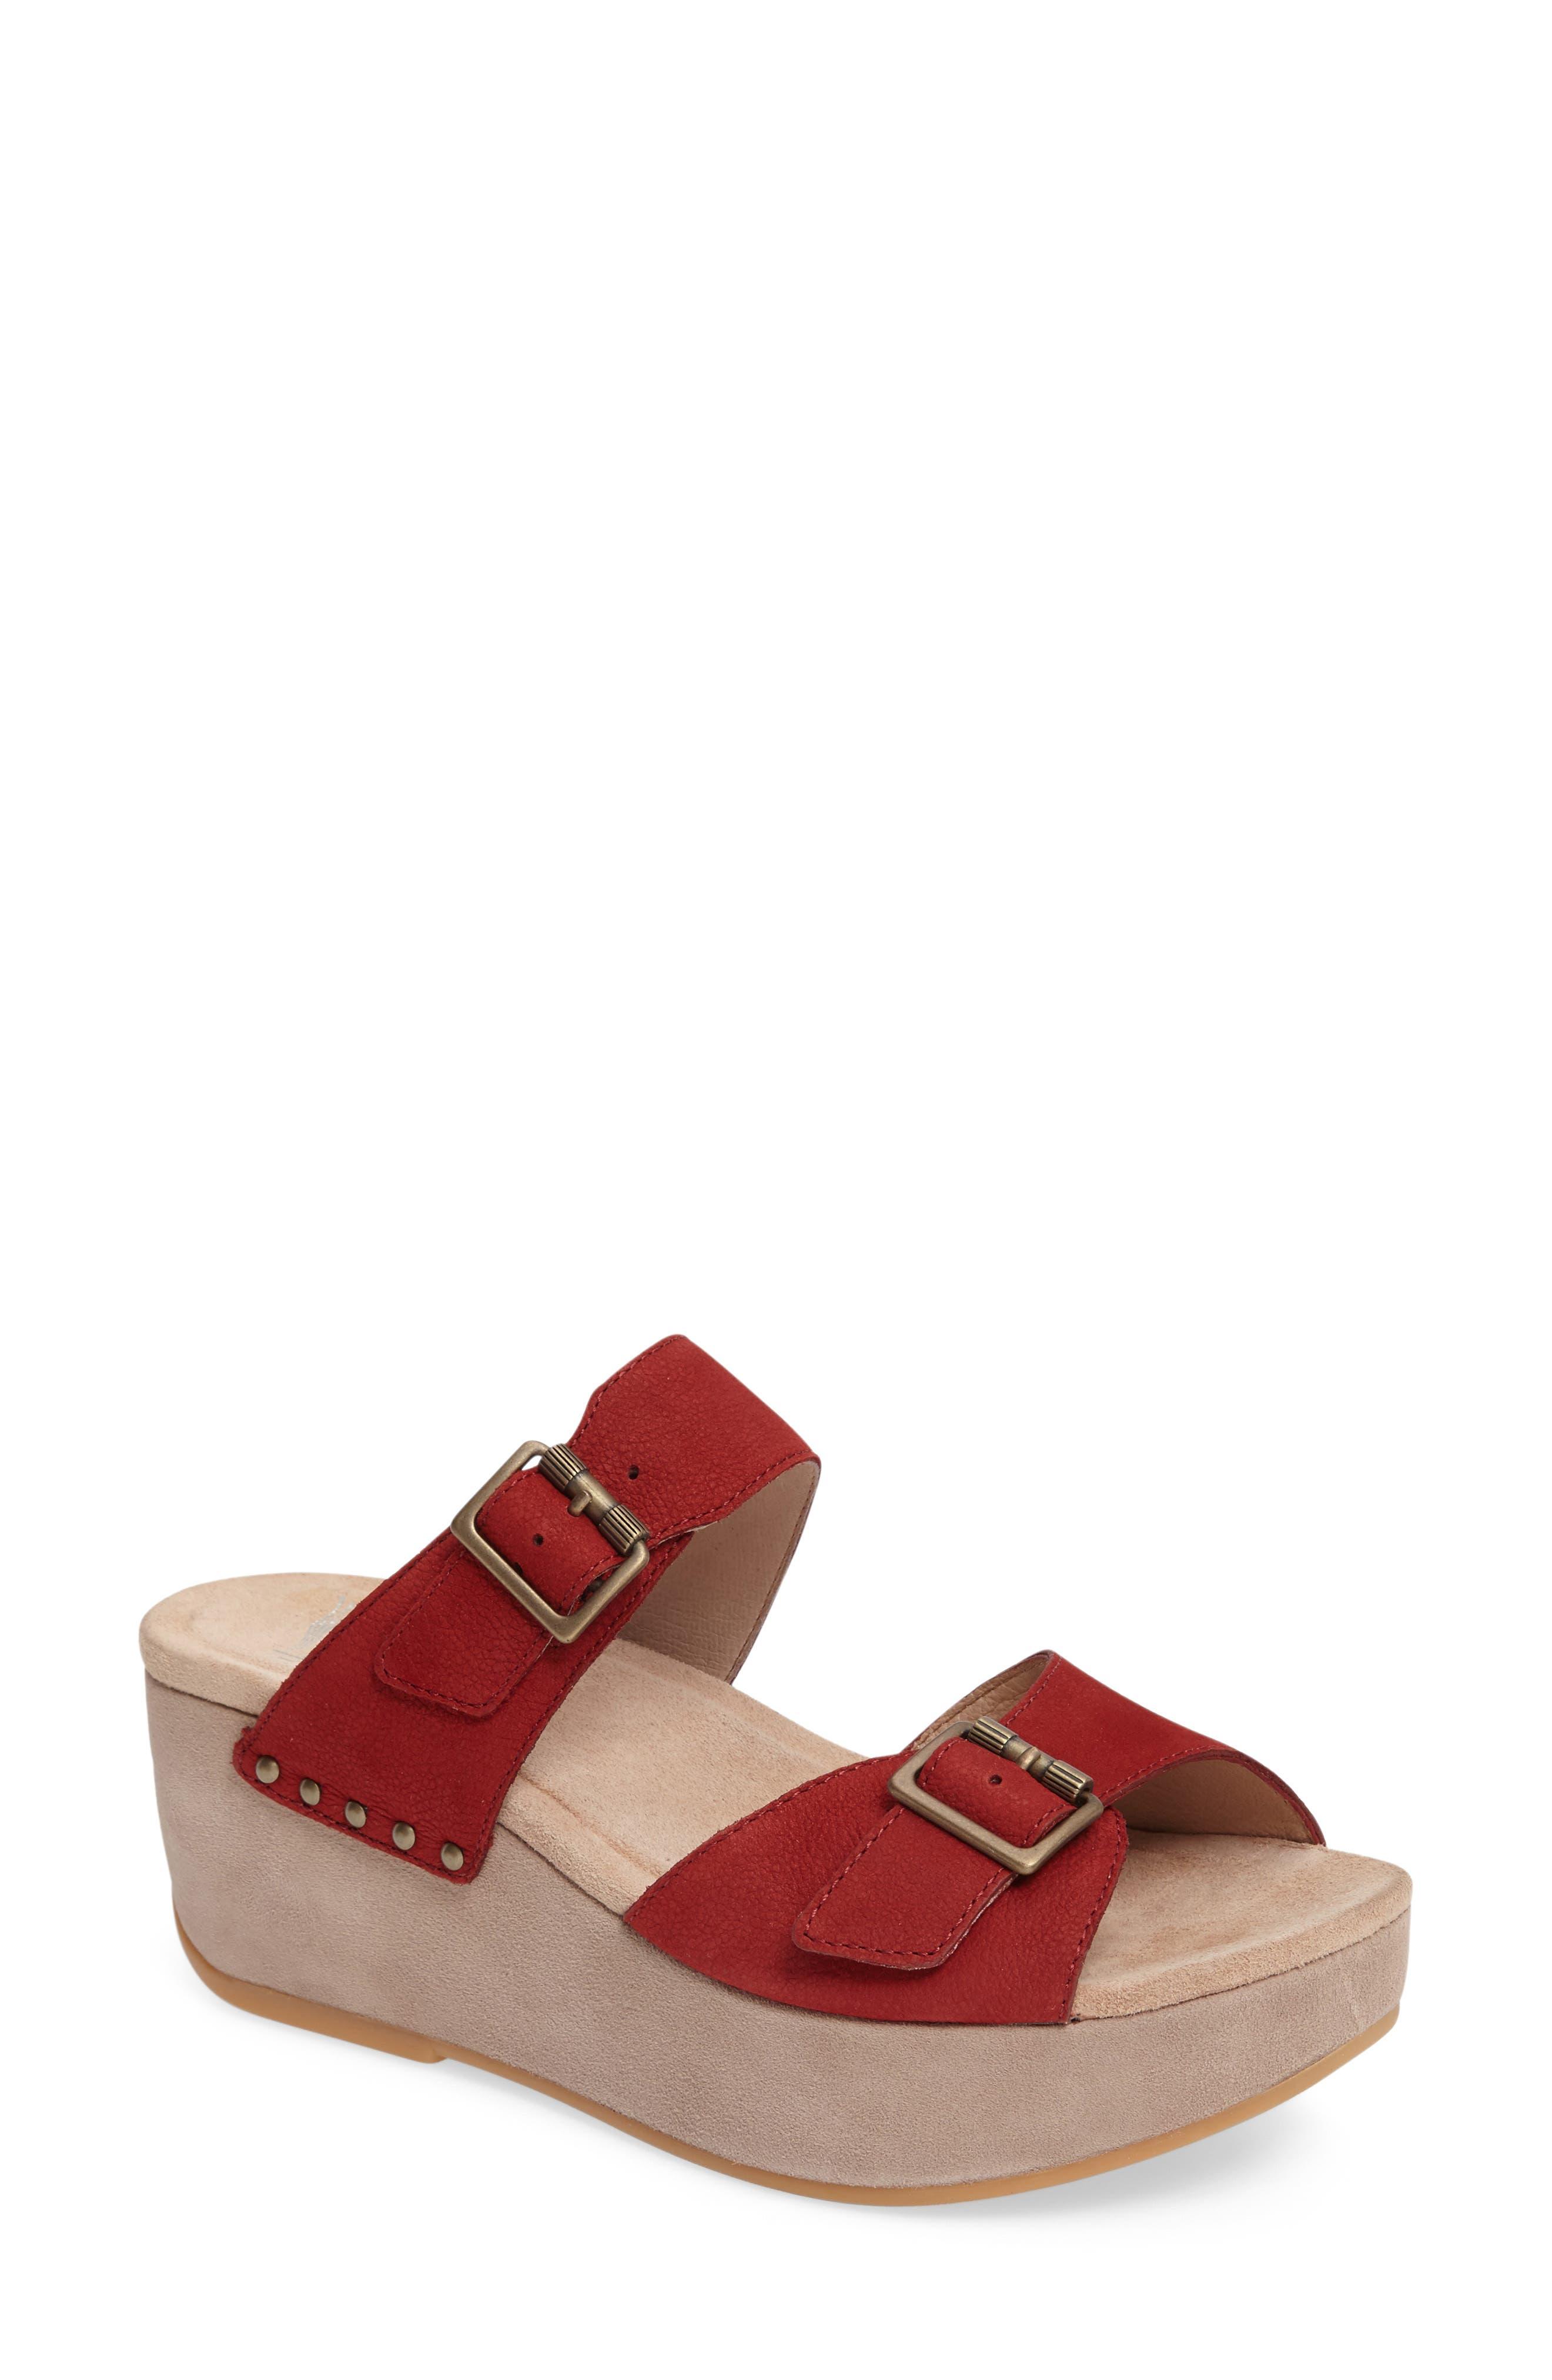 DANSKO Selma Platform Sandal